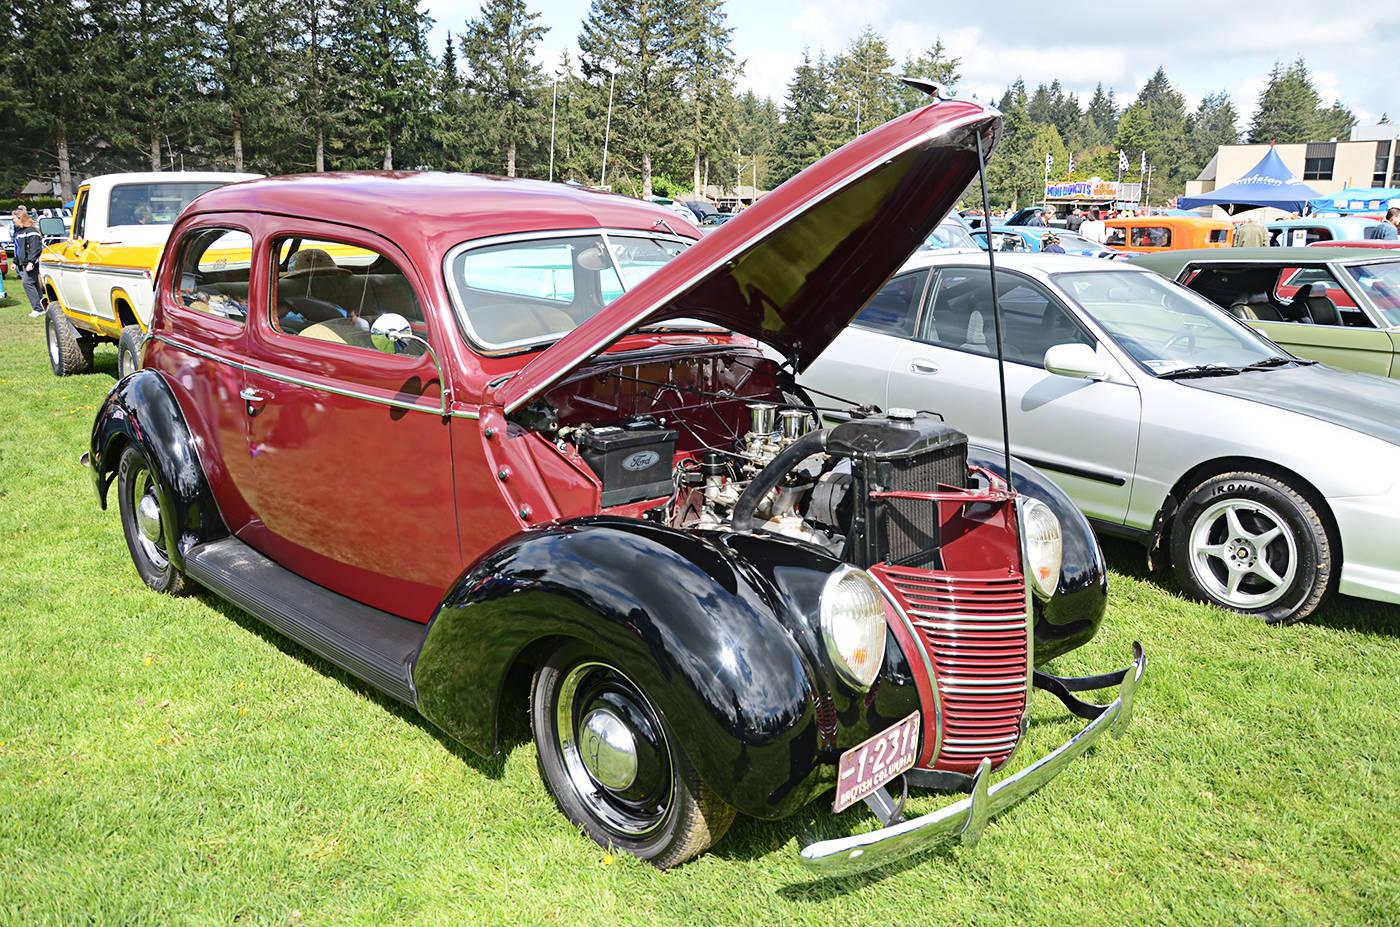 D.W. Poppy Car show hits 30 year milestone